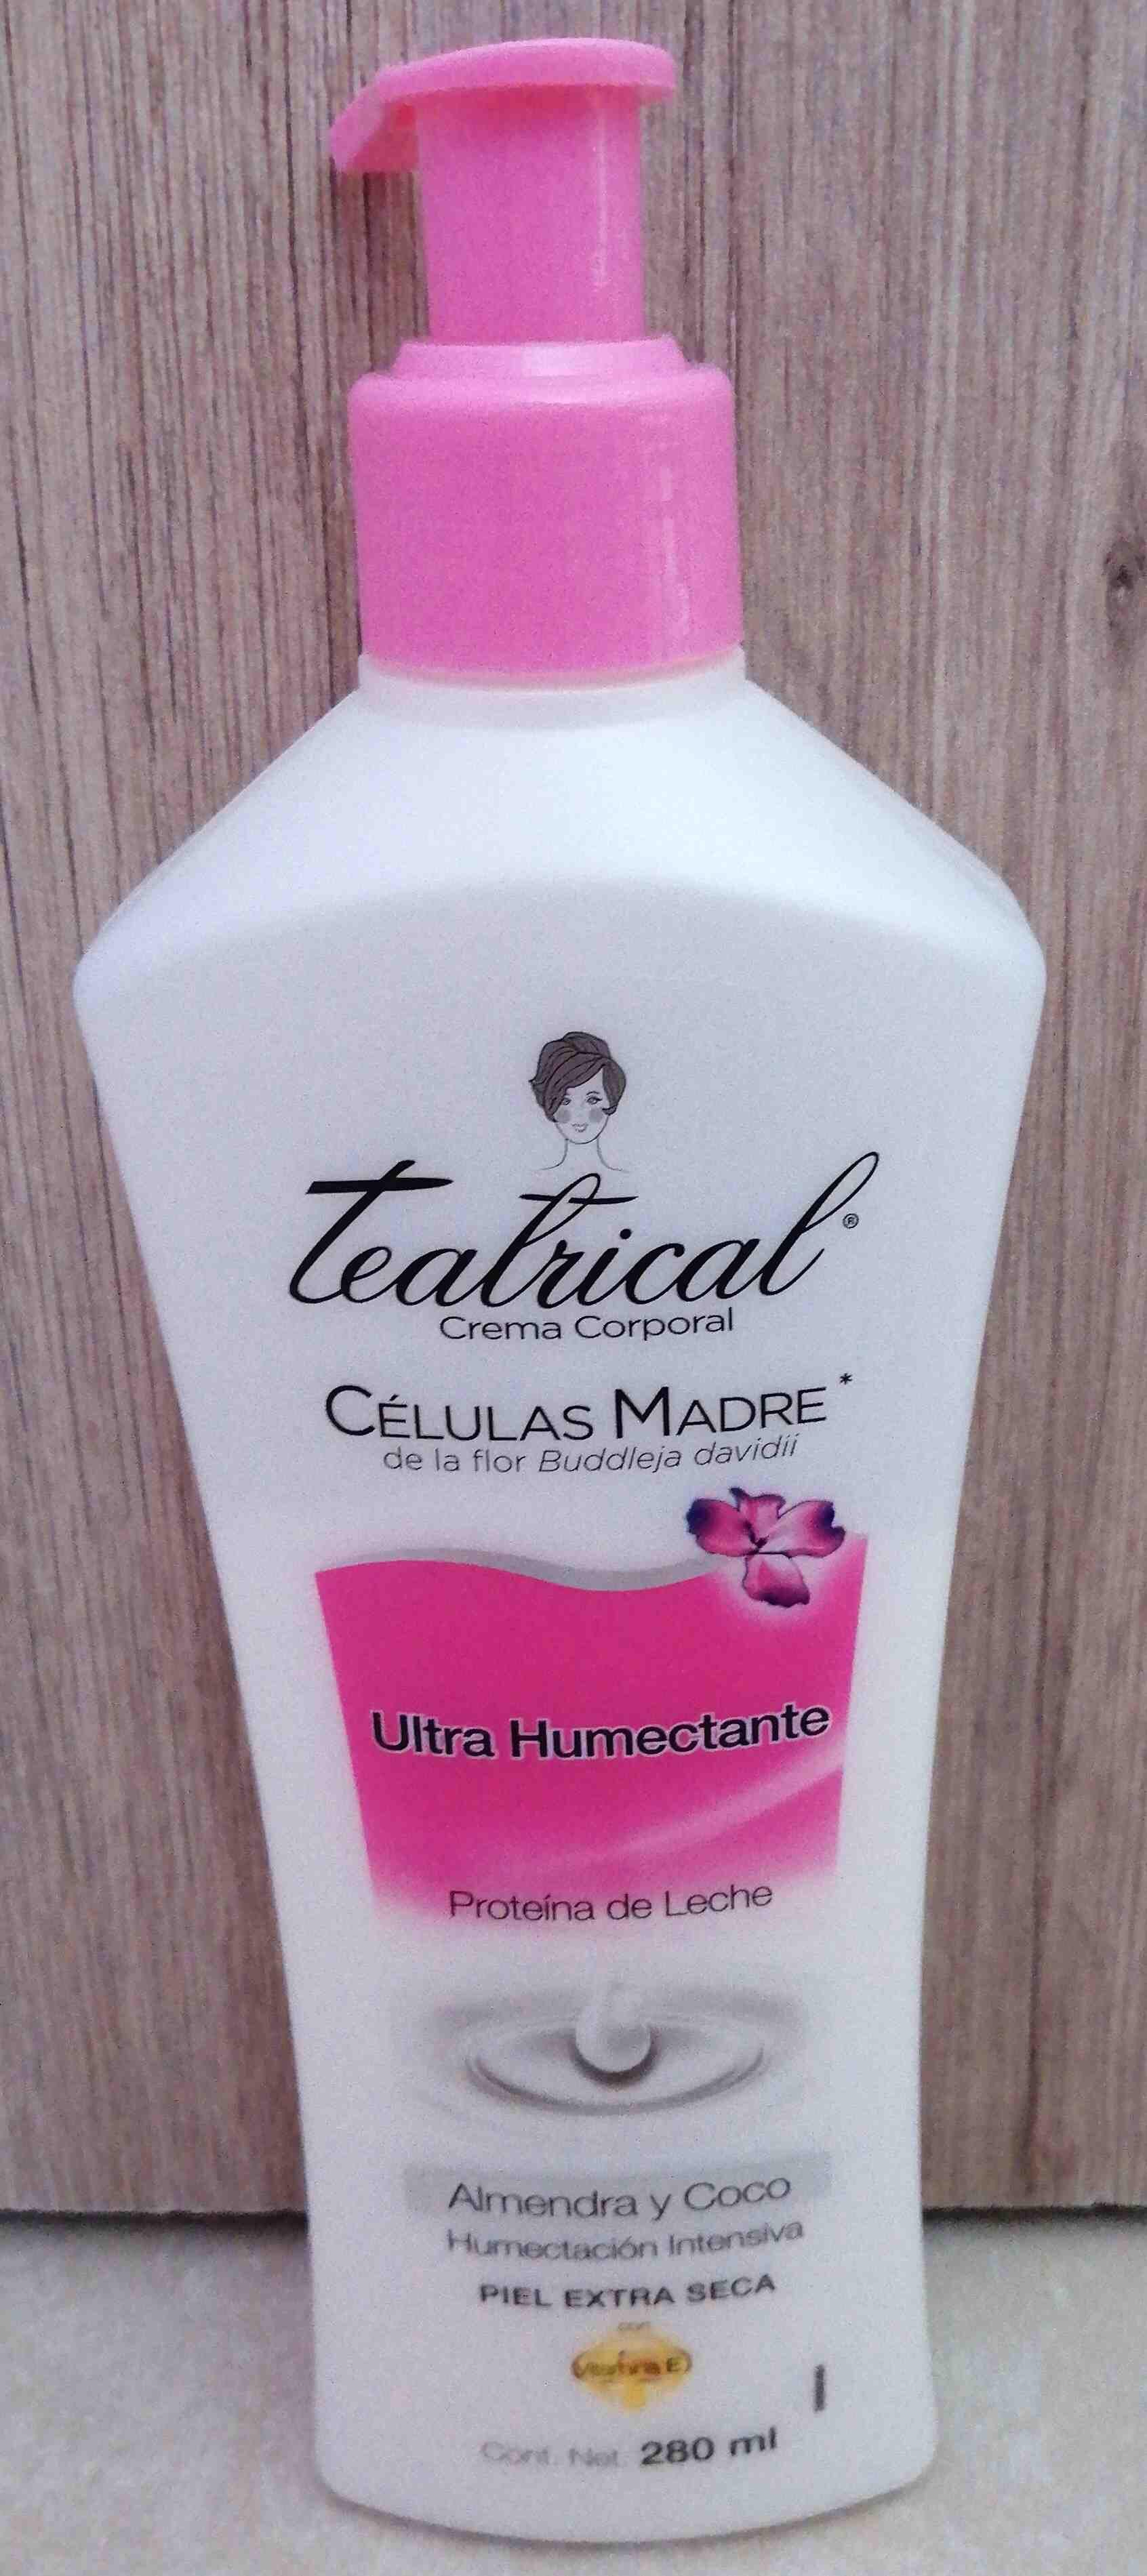 Teatrical - Product - en